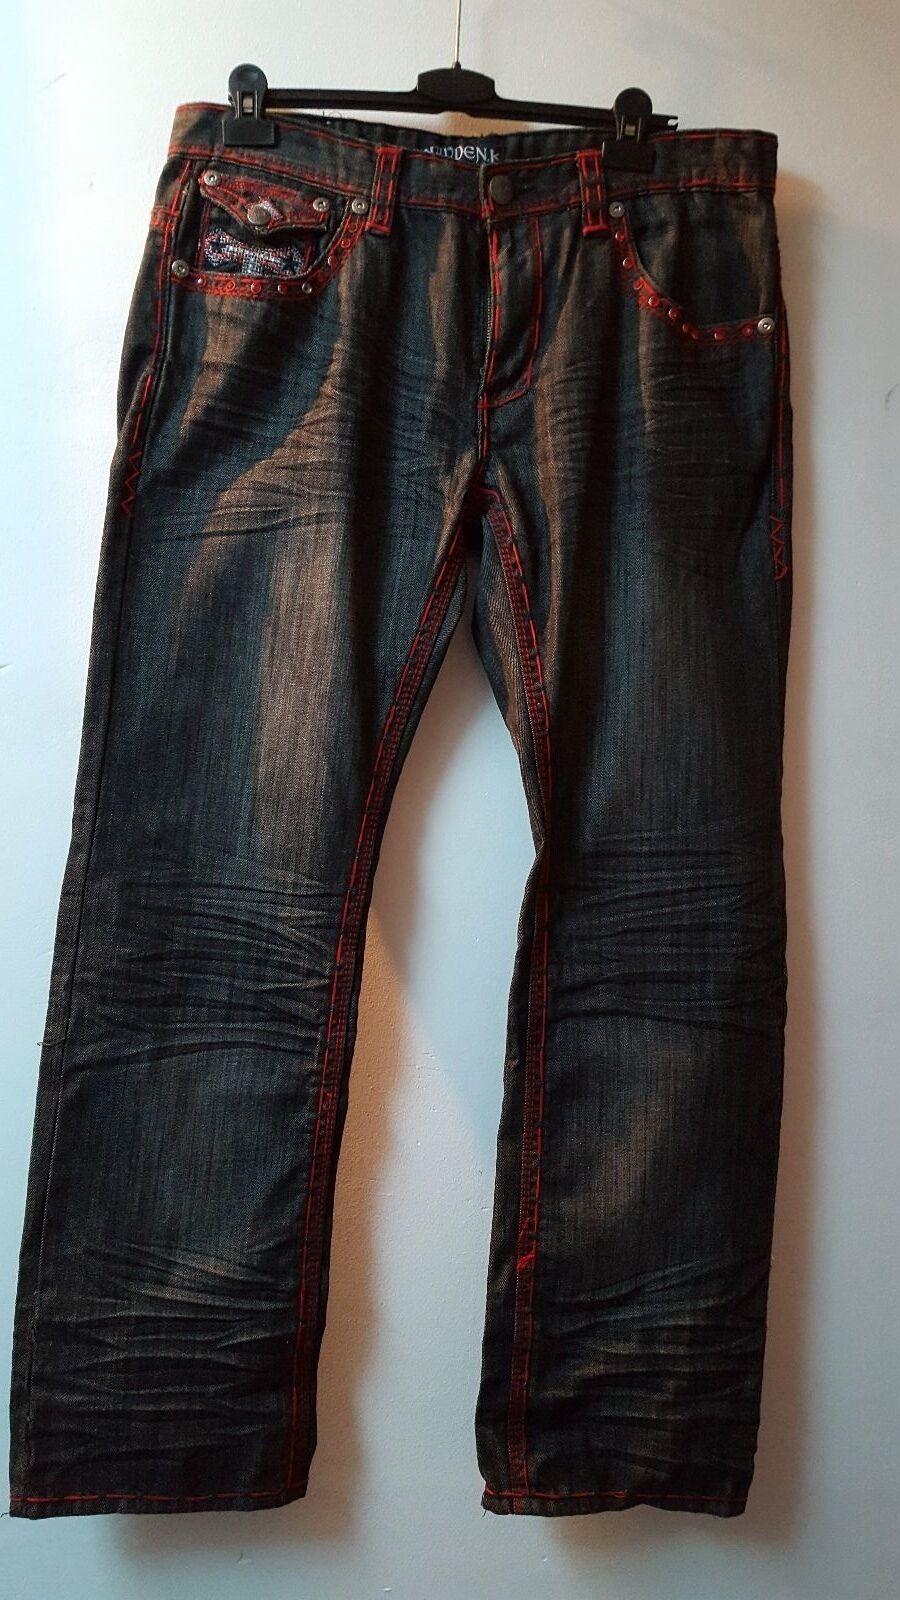 True Kayden K Designer-Jeans Strass Sammler Gr. 36 32 NP 299,-     Günstigen Preis